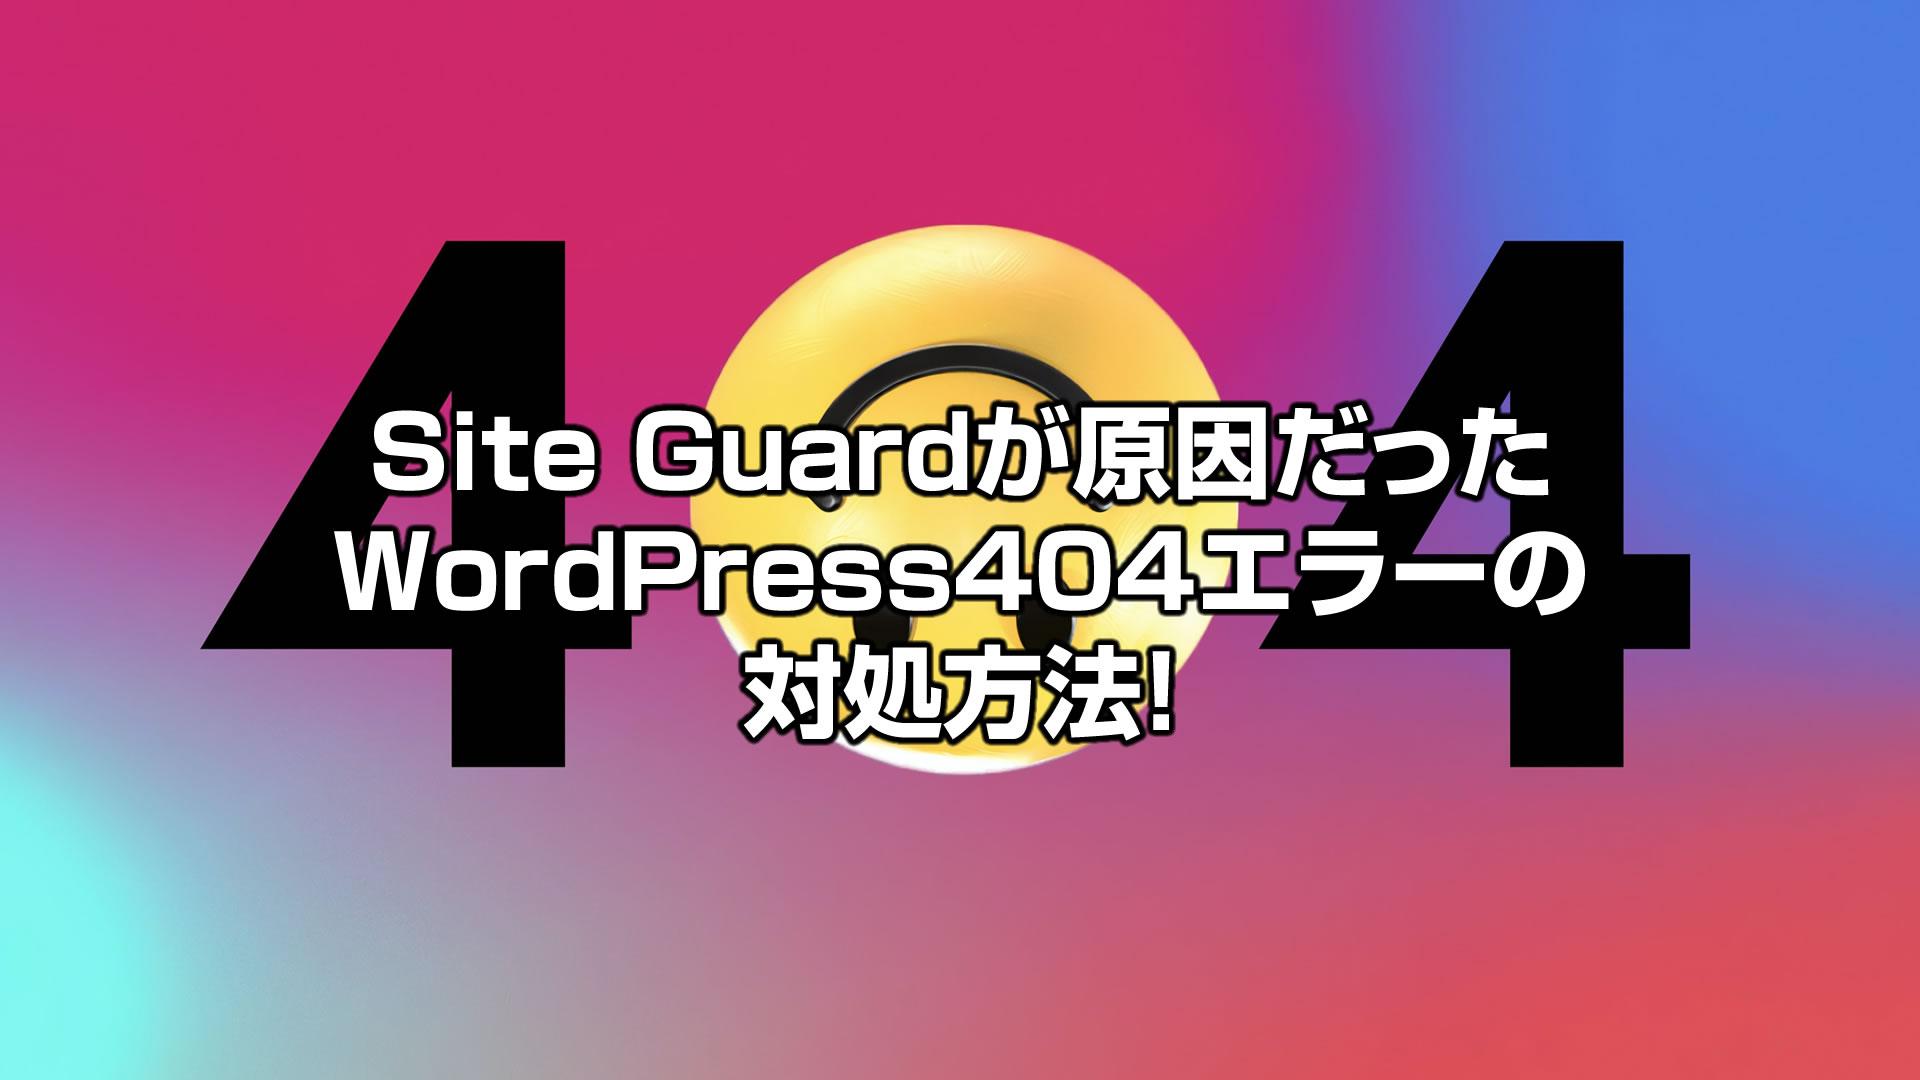 WordPress管理画面の404エラー!Site Guard WP Pluginが原因だった